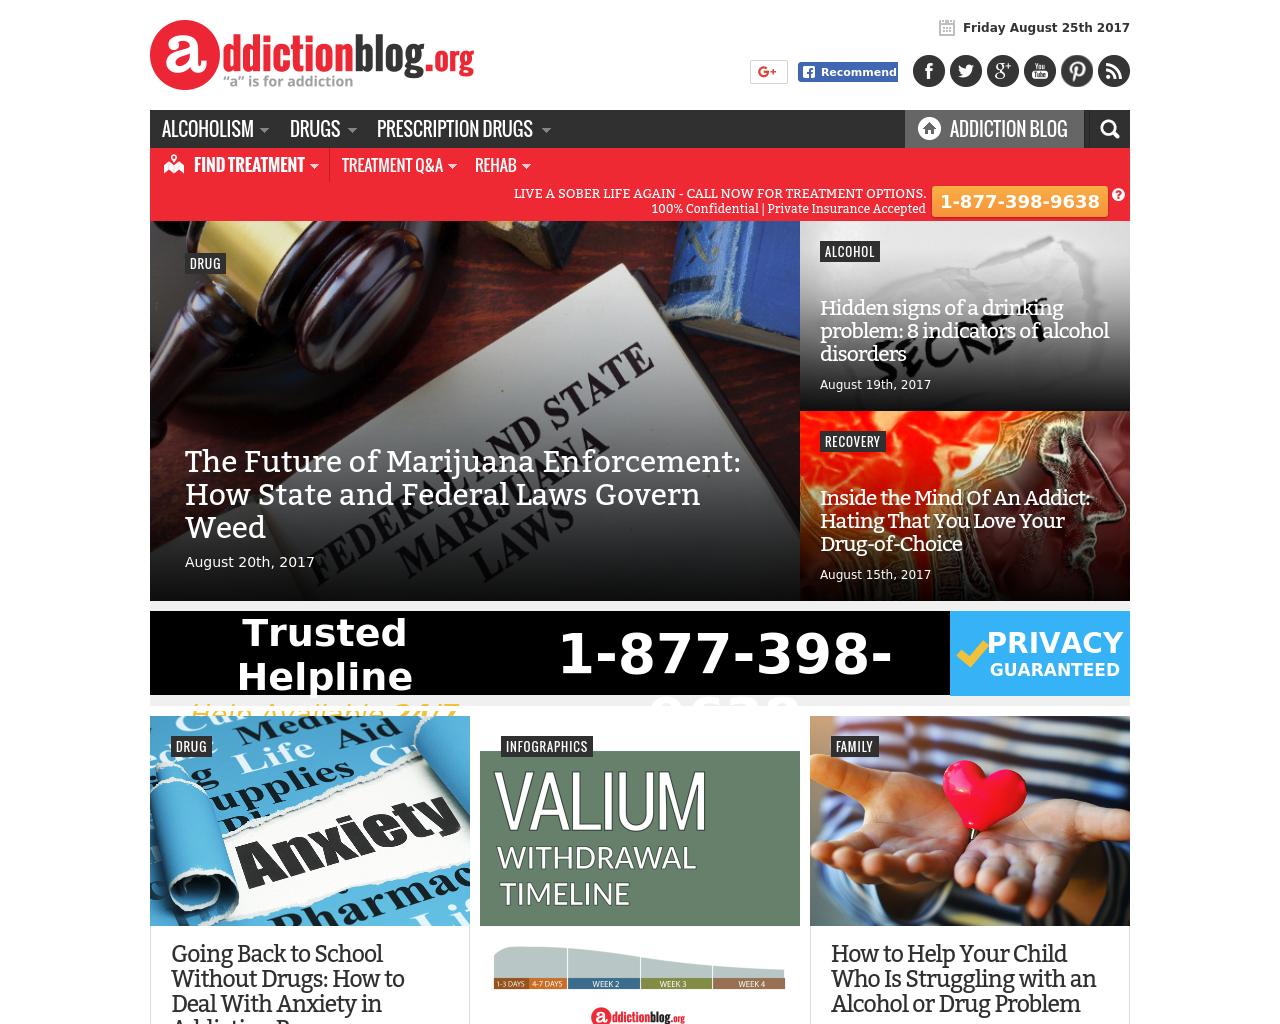 Addiction-Blog-Advertising-Reviews-Pricing